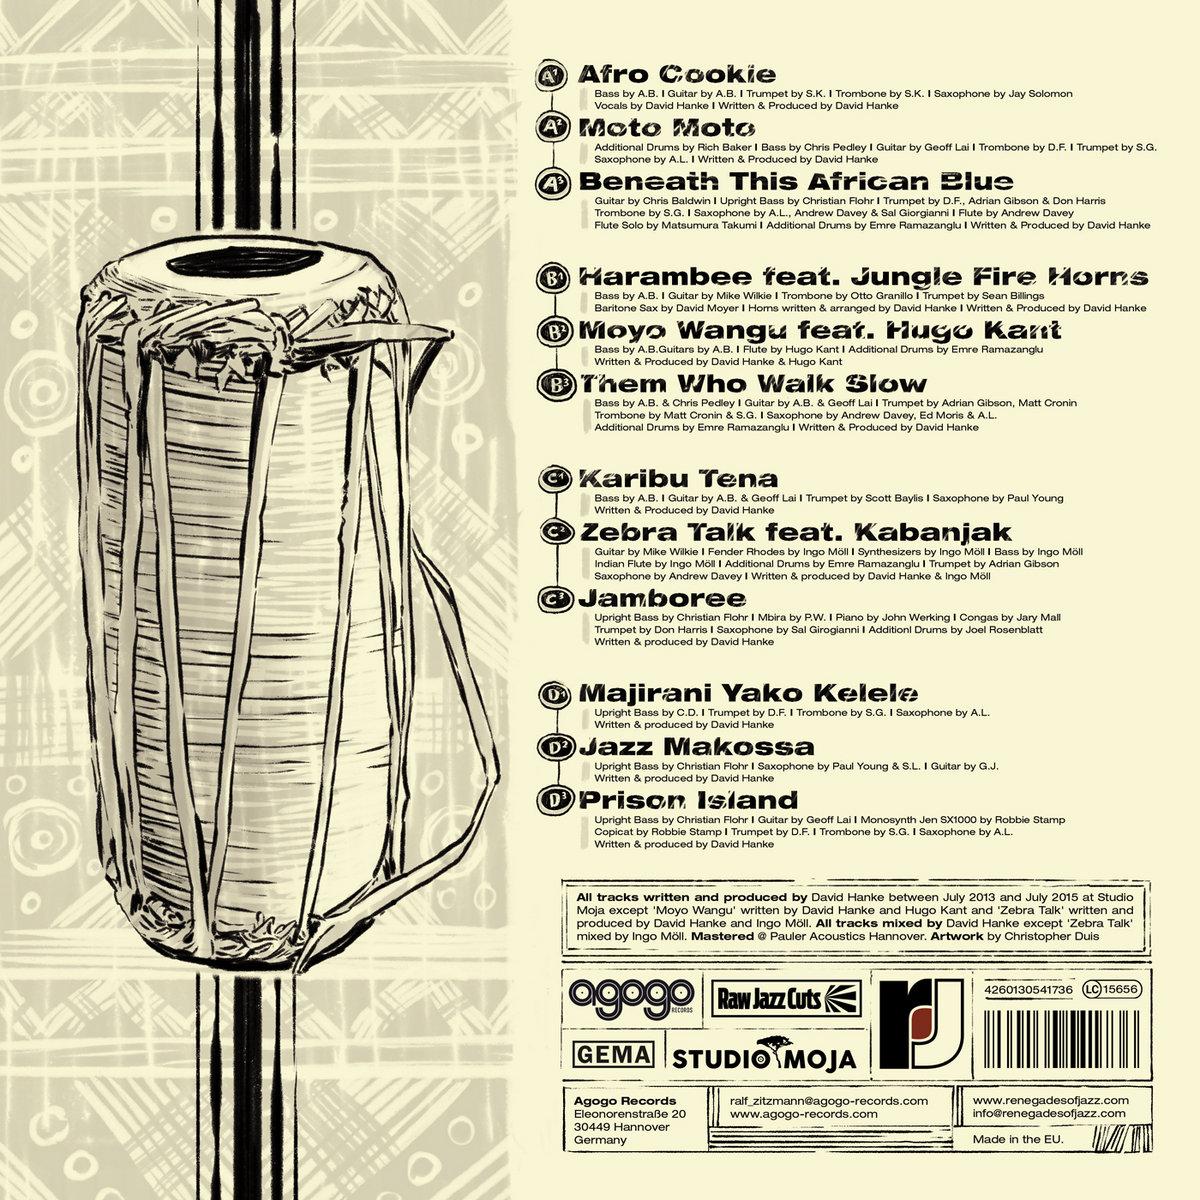 Hugo kant | blog | hittin' the bottle free download.